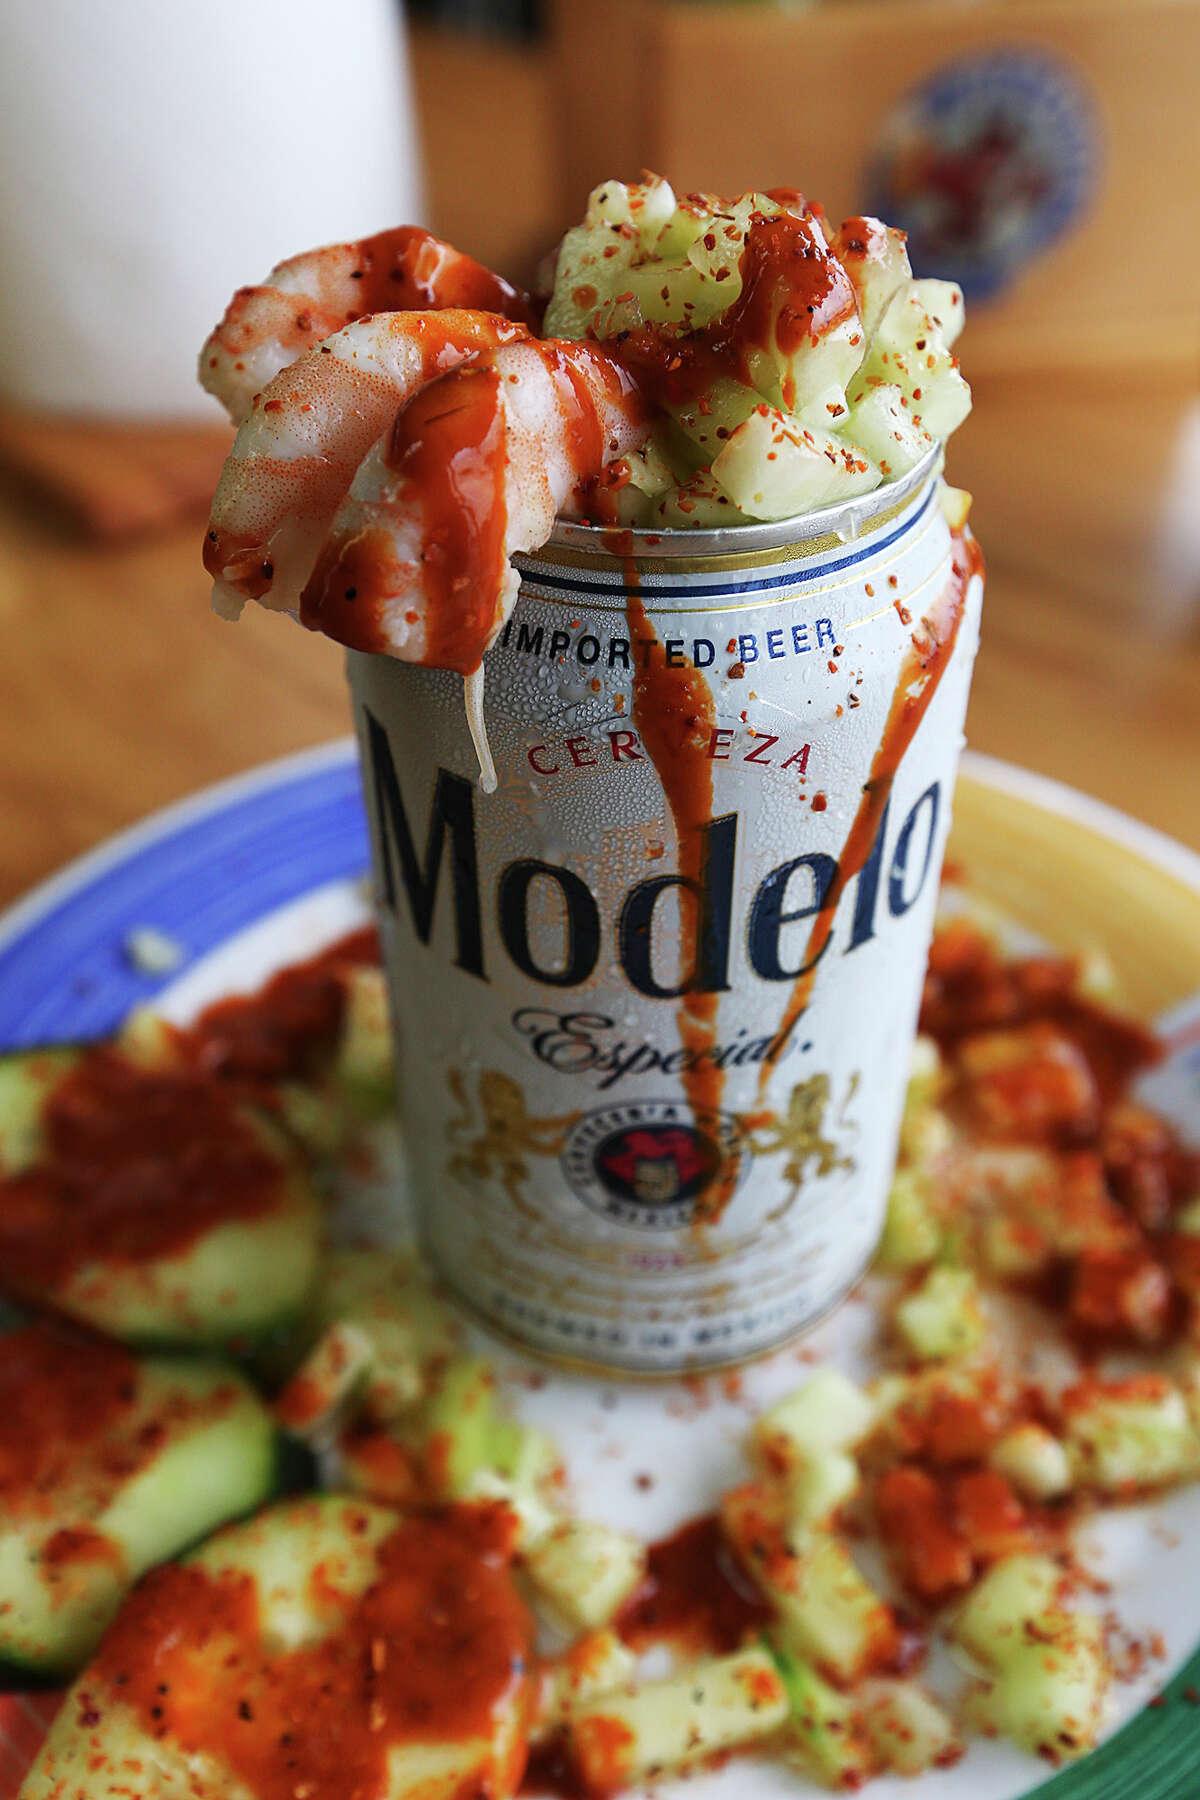 The cerveza preparada at Las Islas Marias, 522 SW Military Drive, includes shrimp, cucumbers and hot sauce.